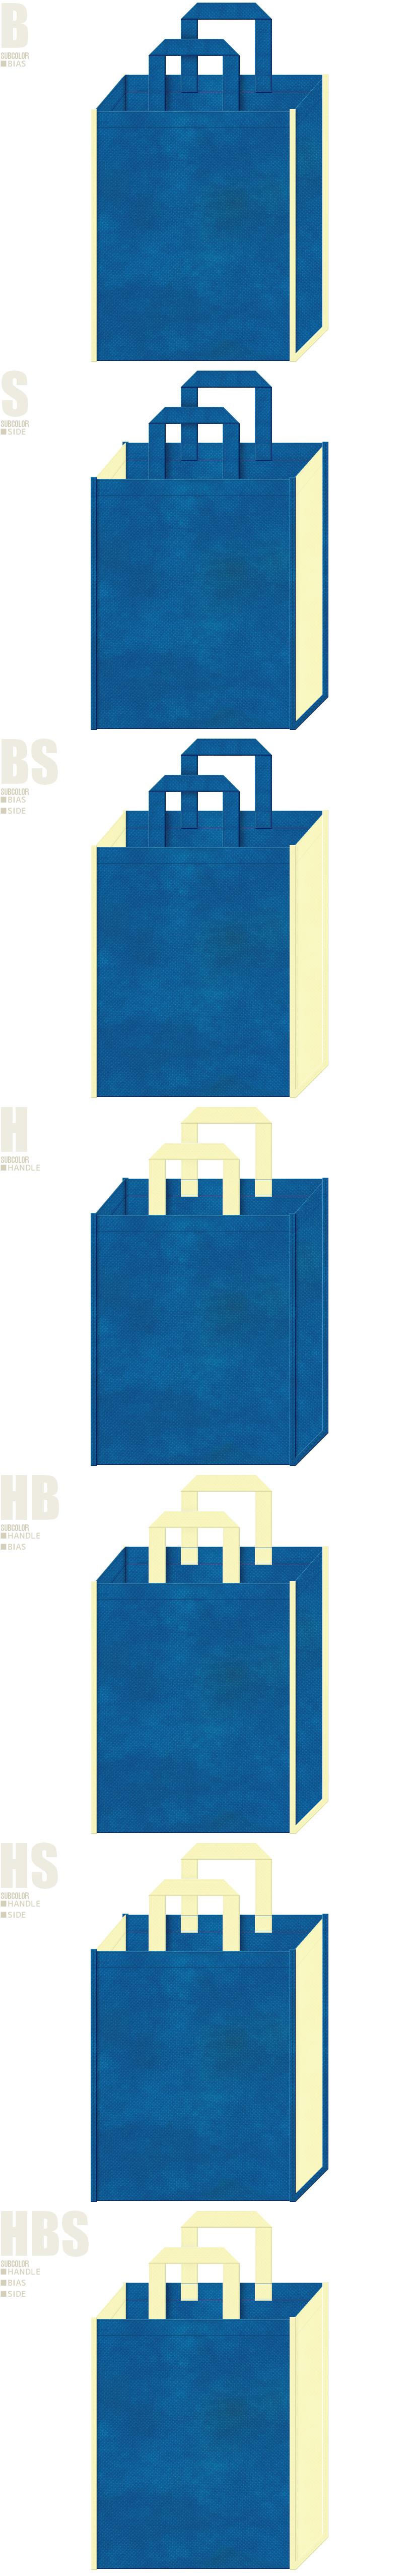 IT・IOT・LED・センサー・ライト・電子部品の展示会用バッグにお奨めの不織布バッグデザイン:青色と薄黄色の配色7パターン